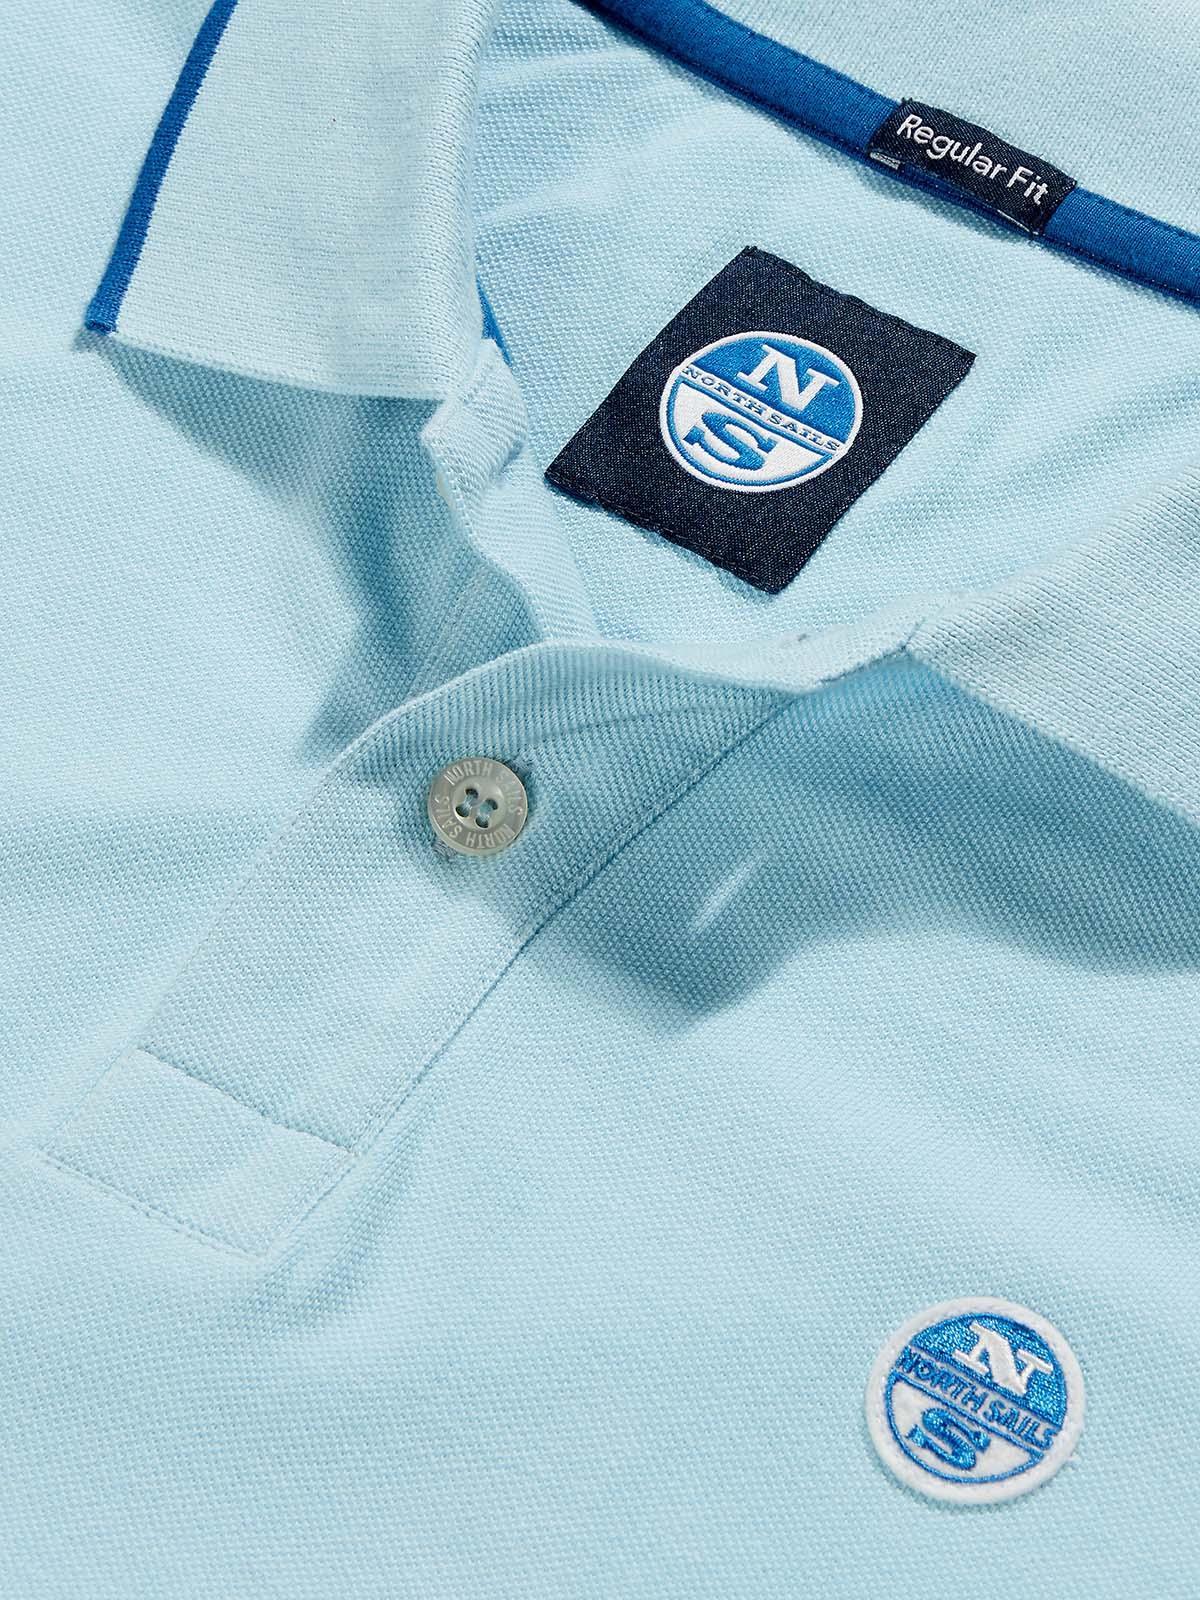 NEW-North-Sails-Legacy-Heritage-Mens-Cotton-Polo-Shirt-Top-Size-S-M-L-XL-XXL-3XL thumbnail 21